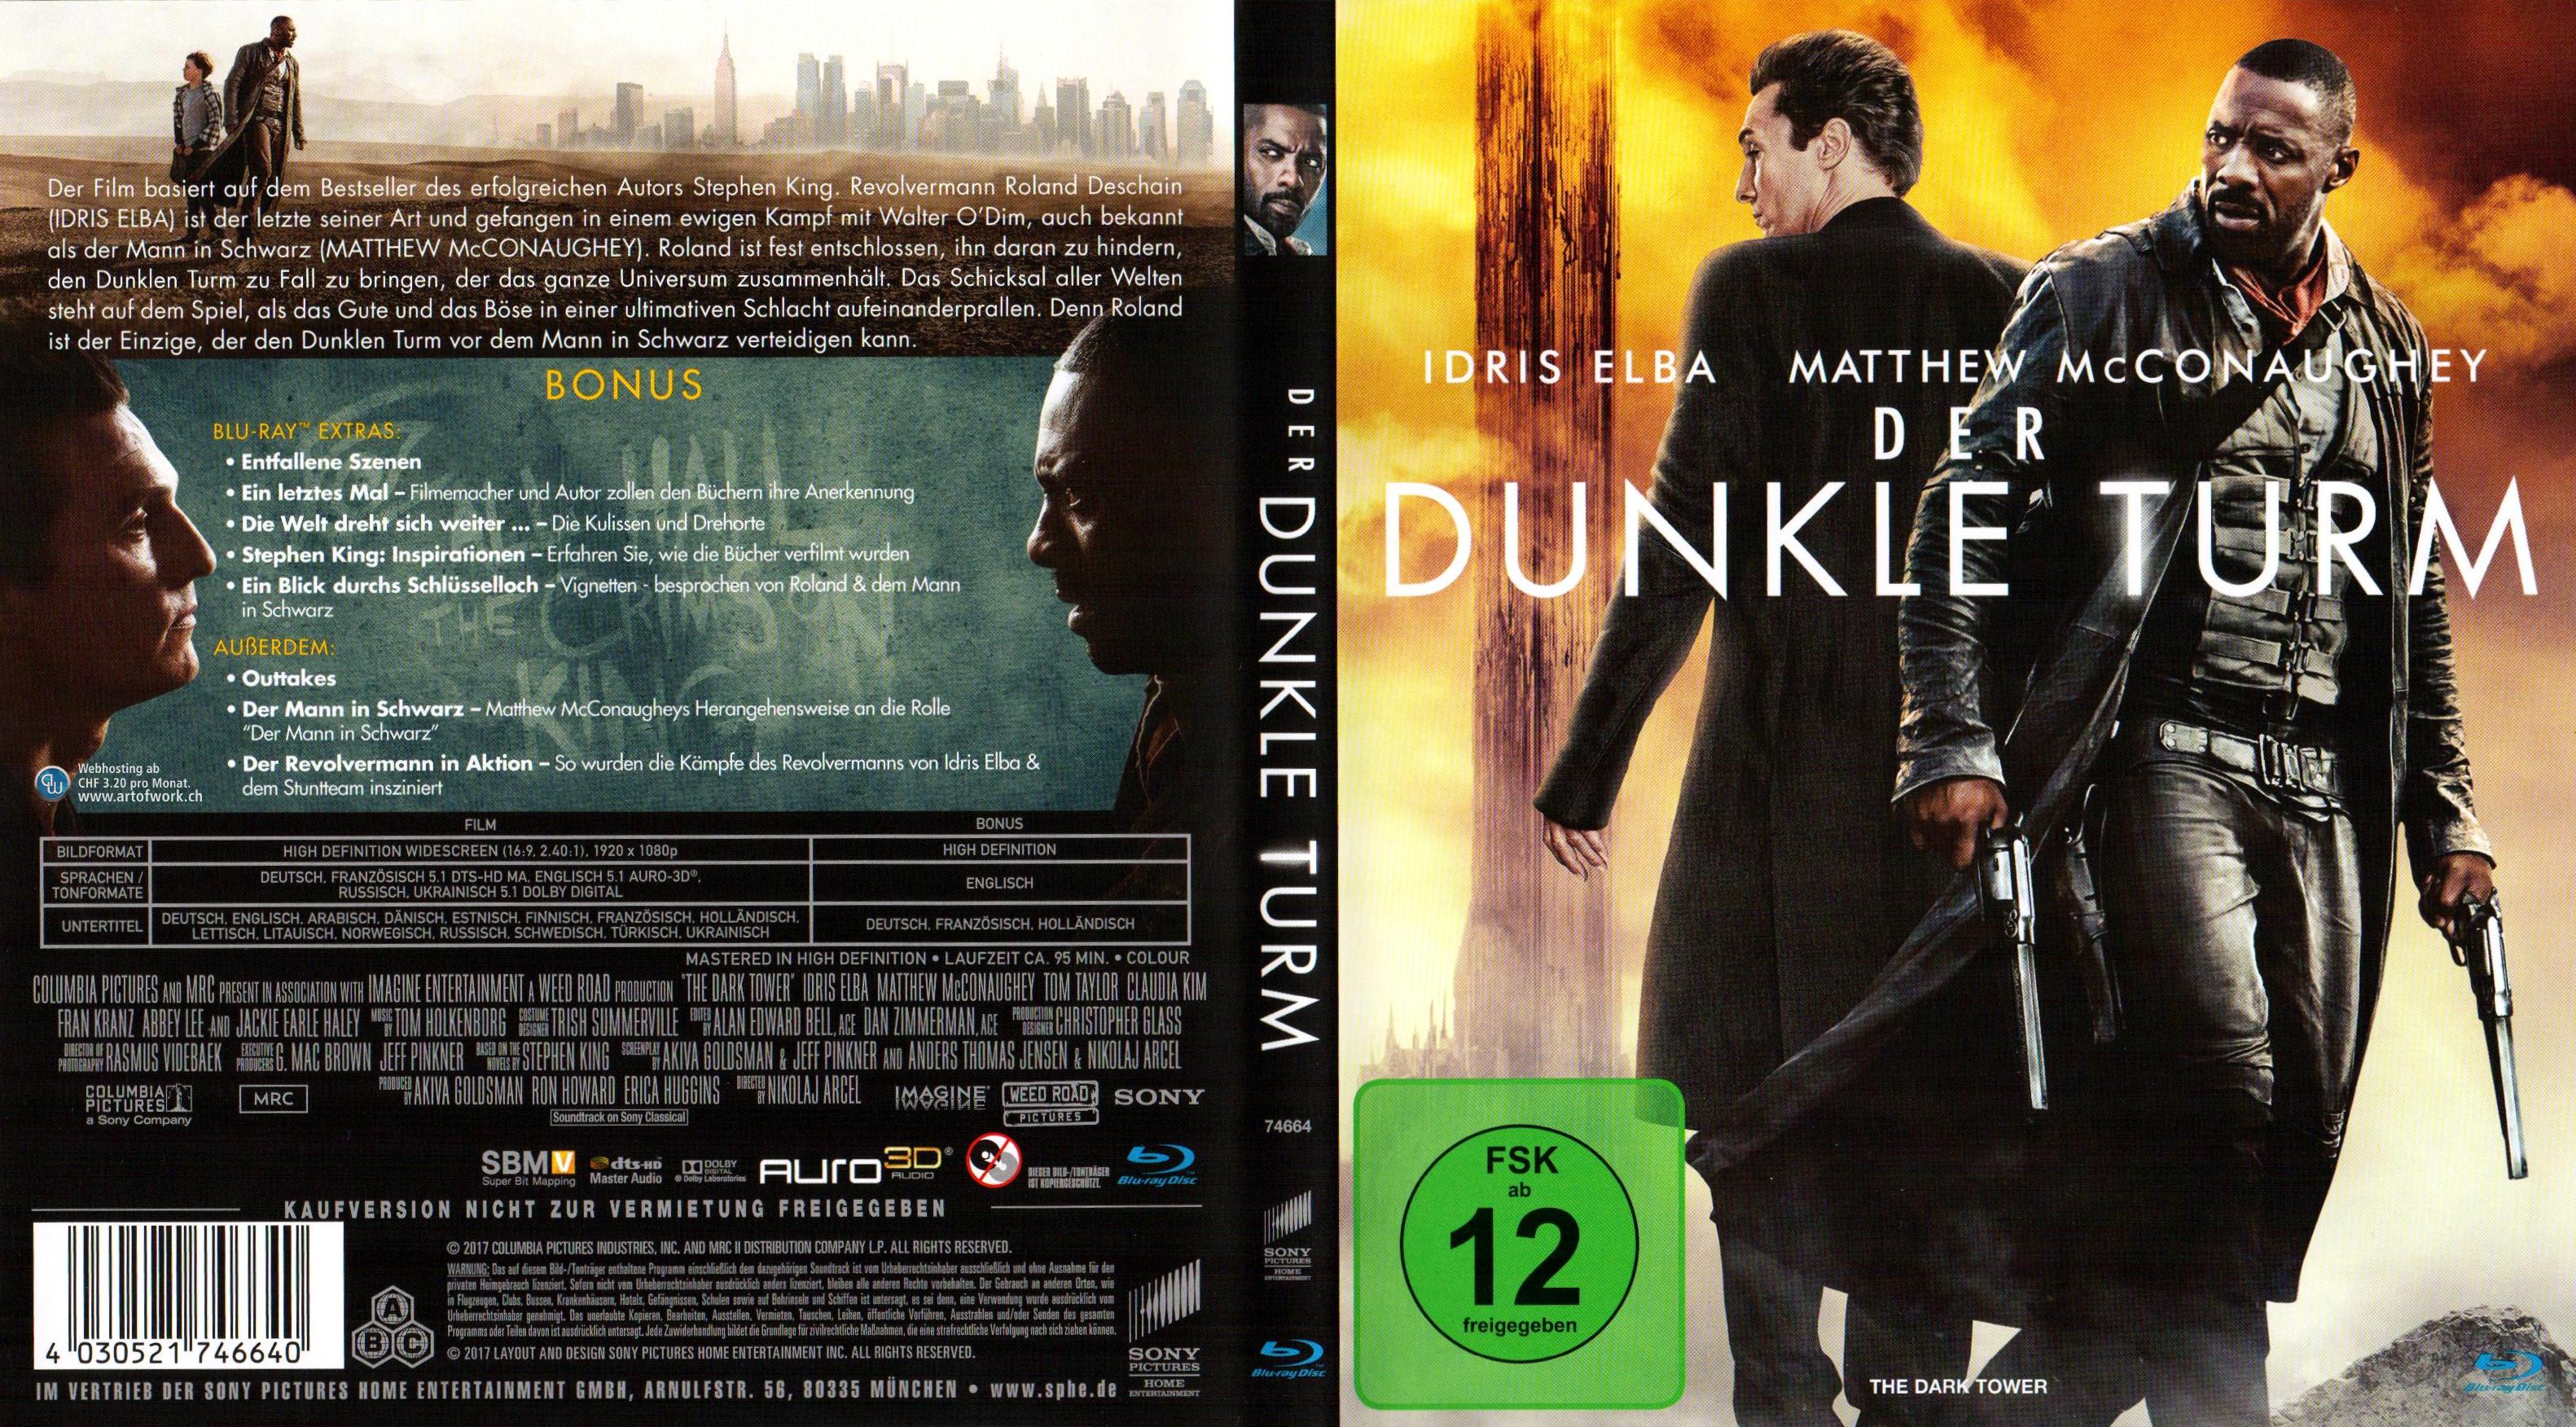 Der Dunkle Turm Stephen King Cover Deutsch German german